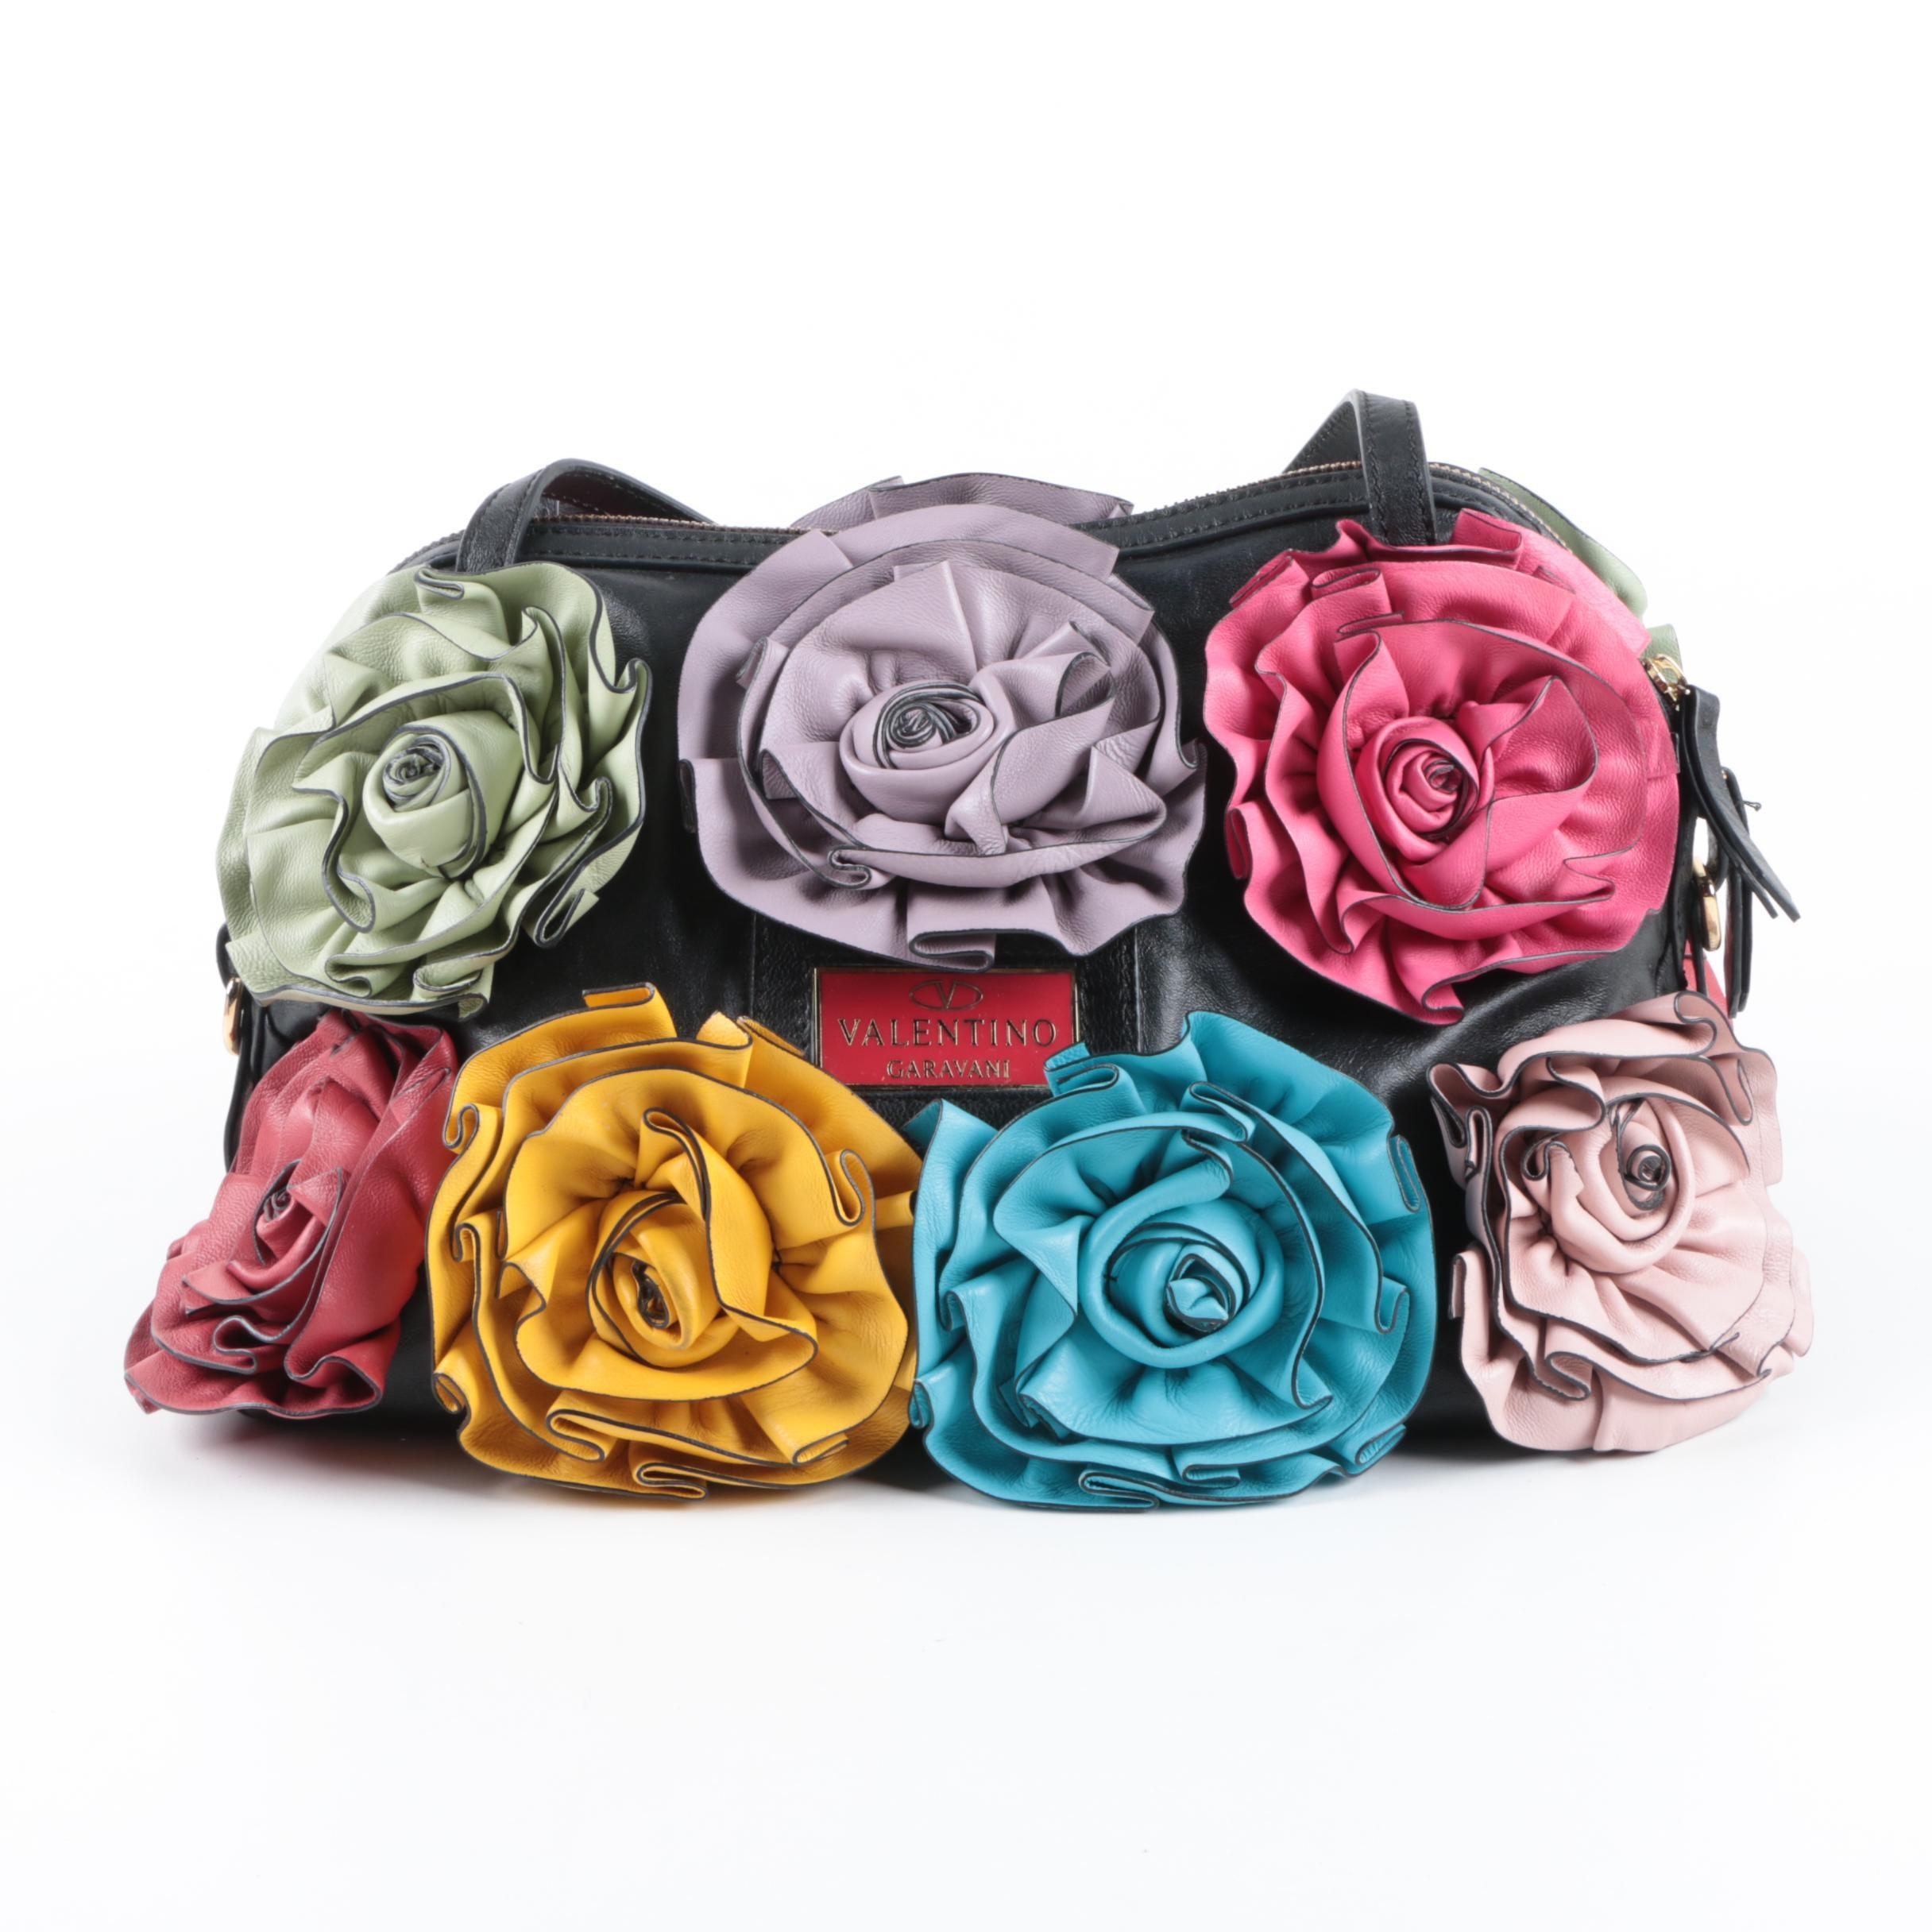 Valentino Leather Rosette Handbag